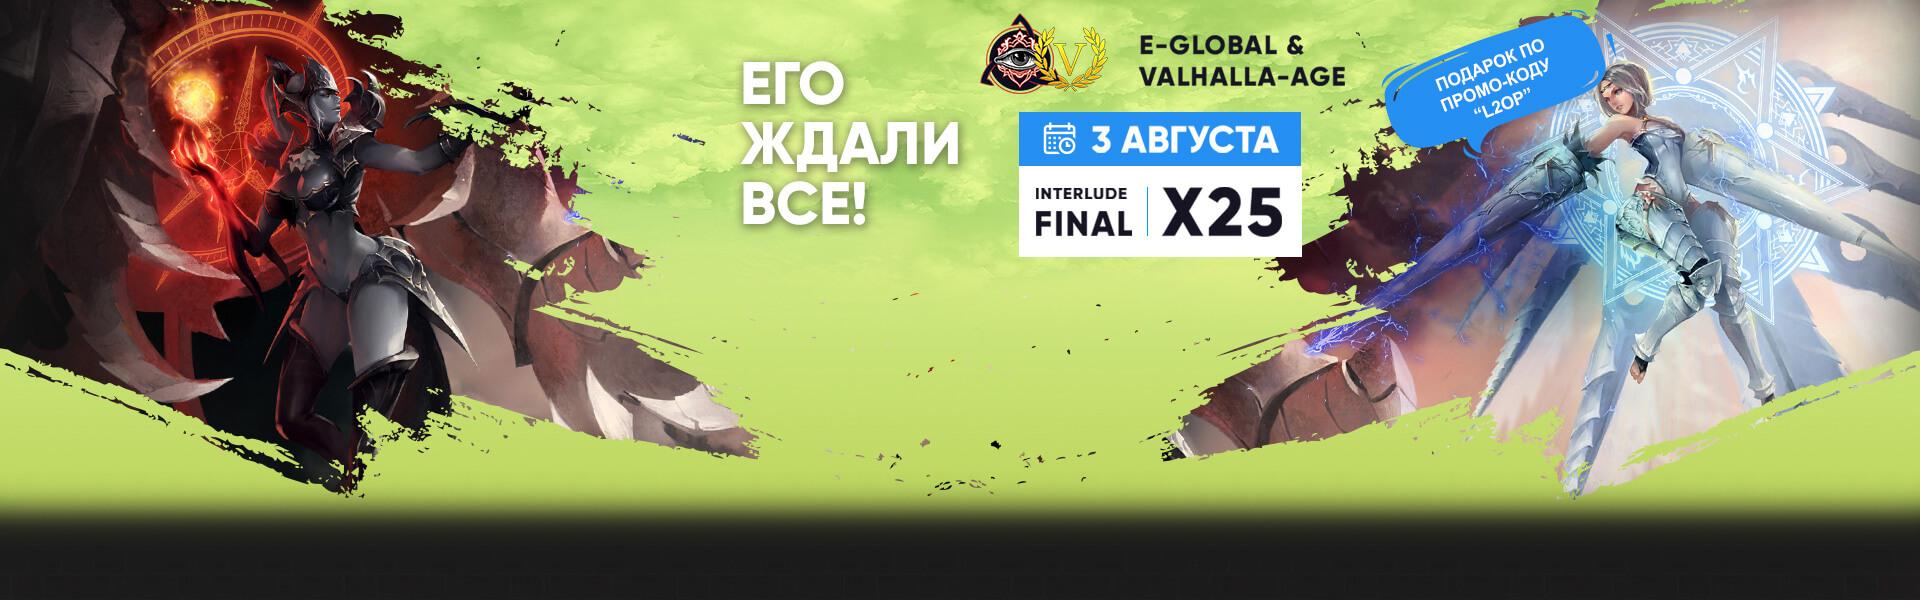 E-global & Valhalla Age